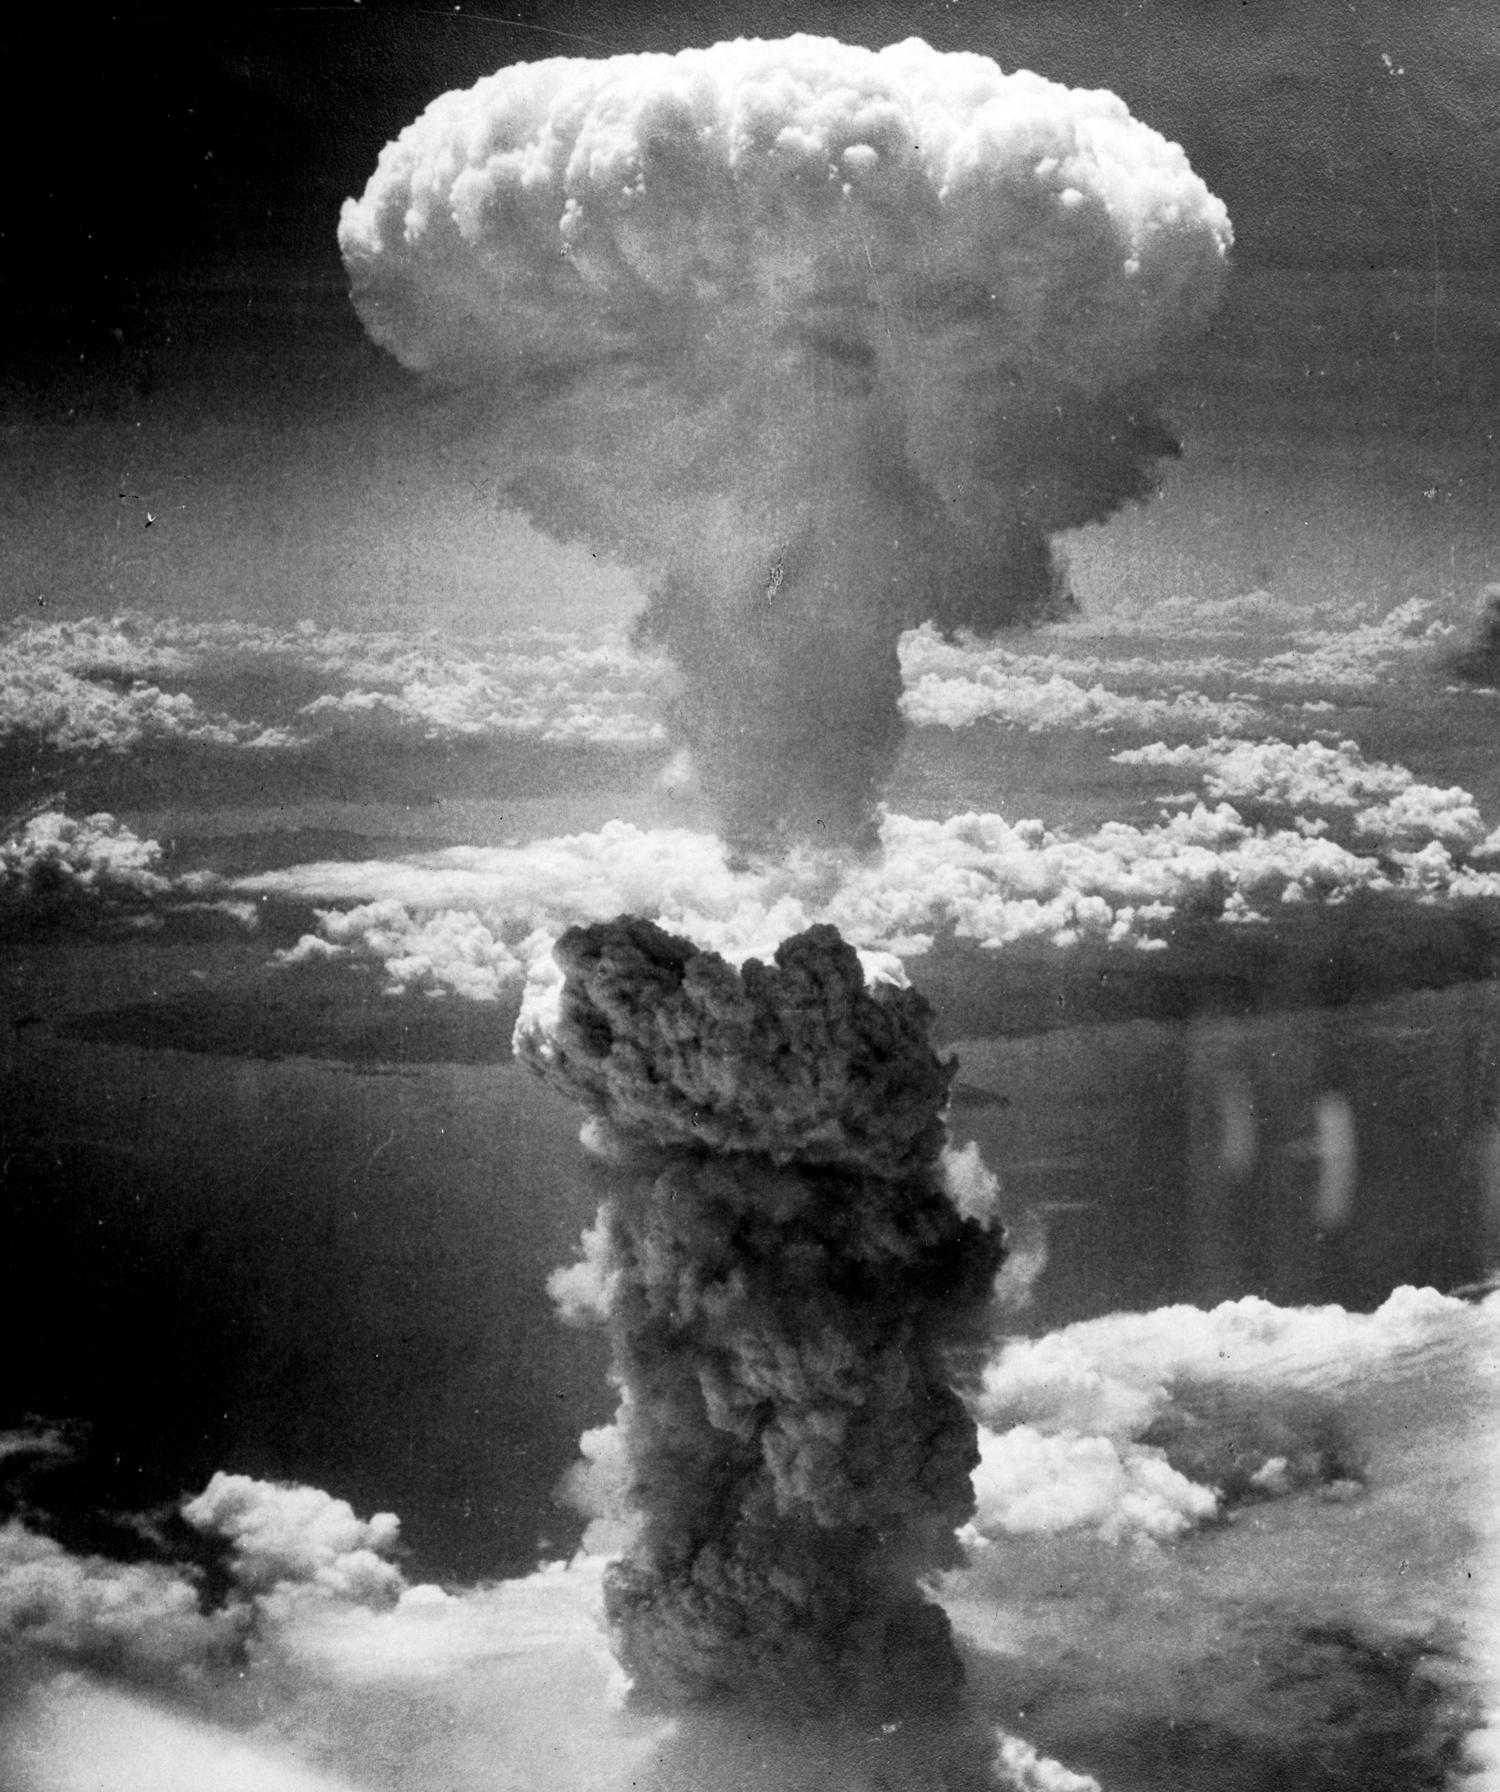 http://static1.squarespace.com/static/54b9309be4b06e38ad5da1ca/t/554bce37e4b03b9398acc60b/1431031445195/nuclear.jpg?format=1500w